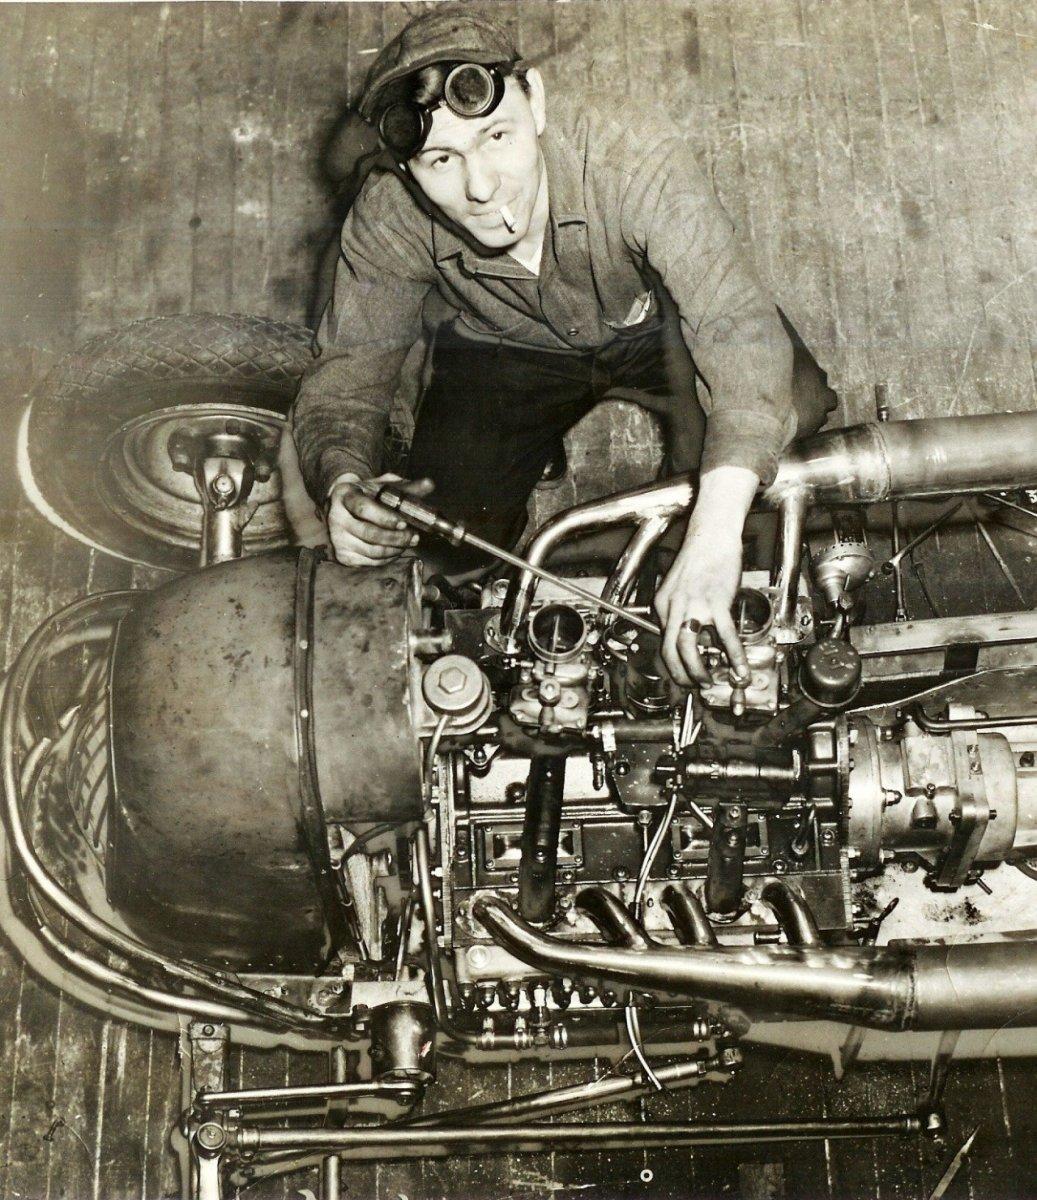 engine1 Dick Harroun in 1941 wit.jpg